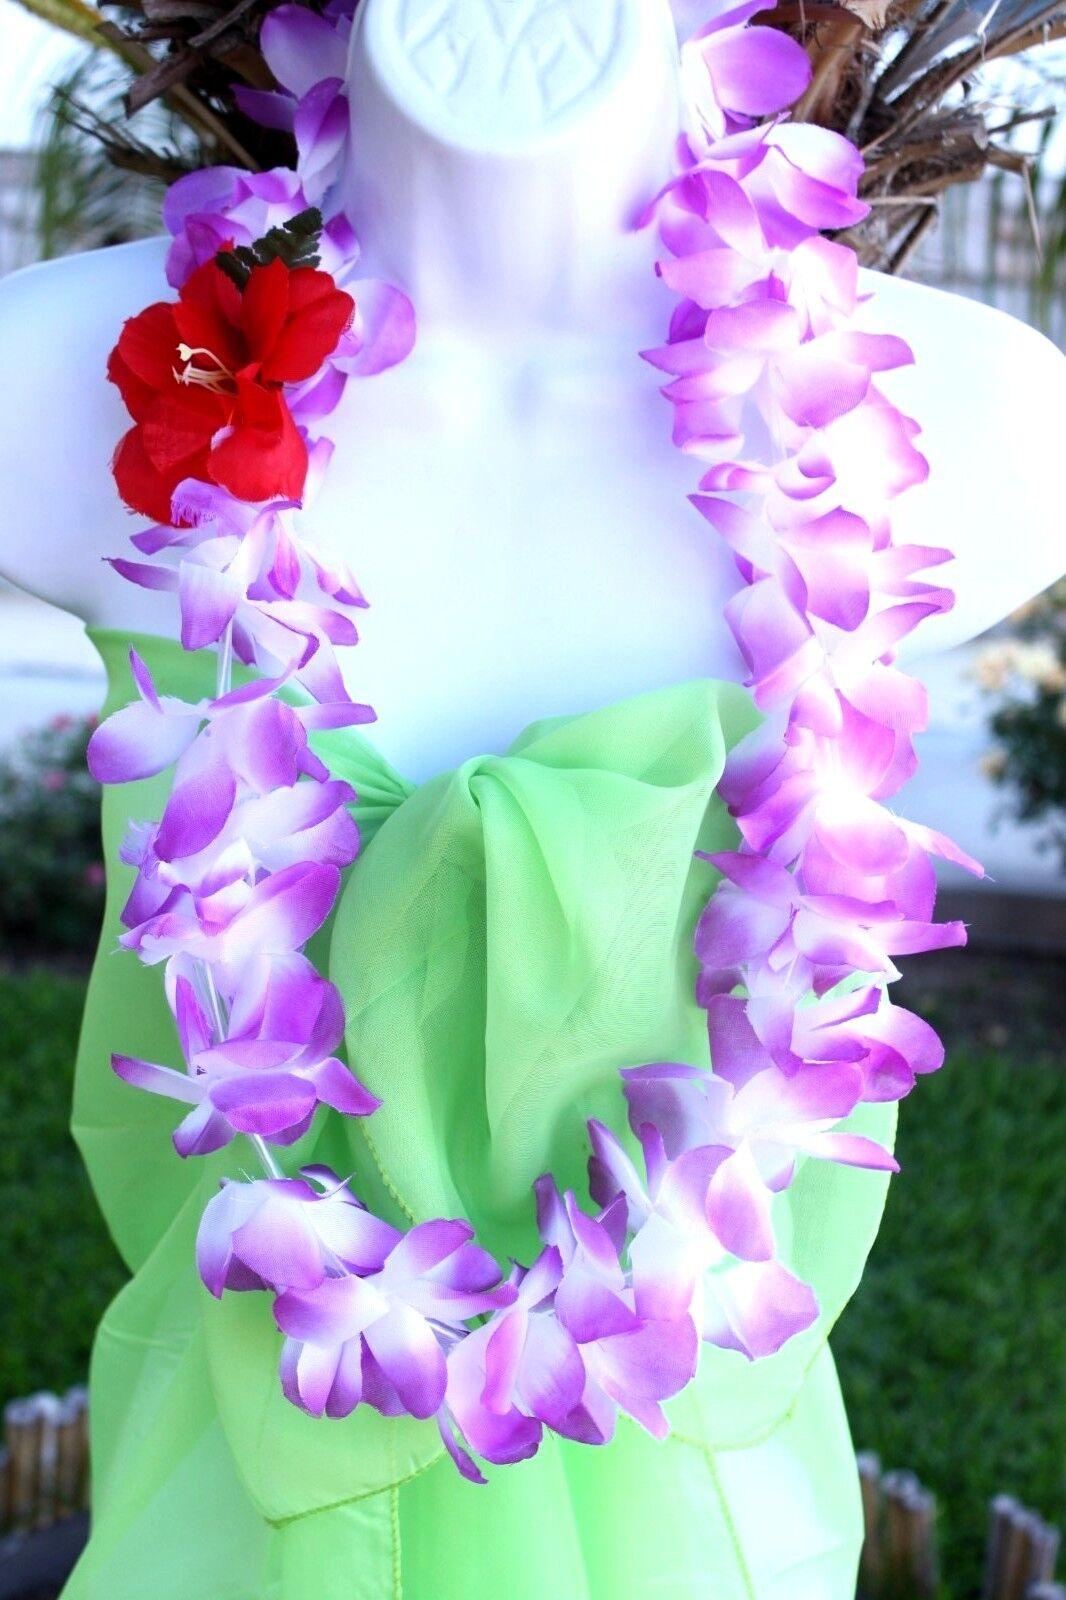 Six Hawaiian Hawaii Flower Lei Hula Luau Party Favor Necklace Purple